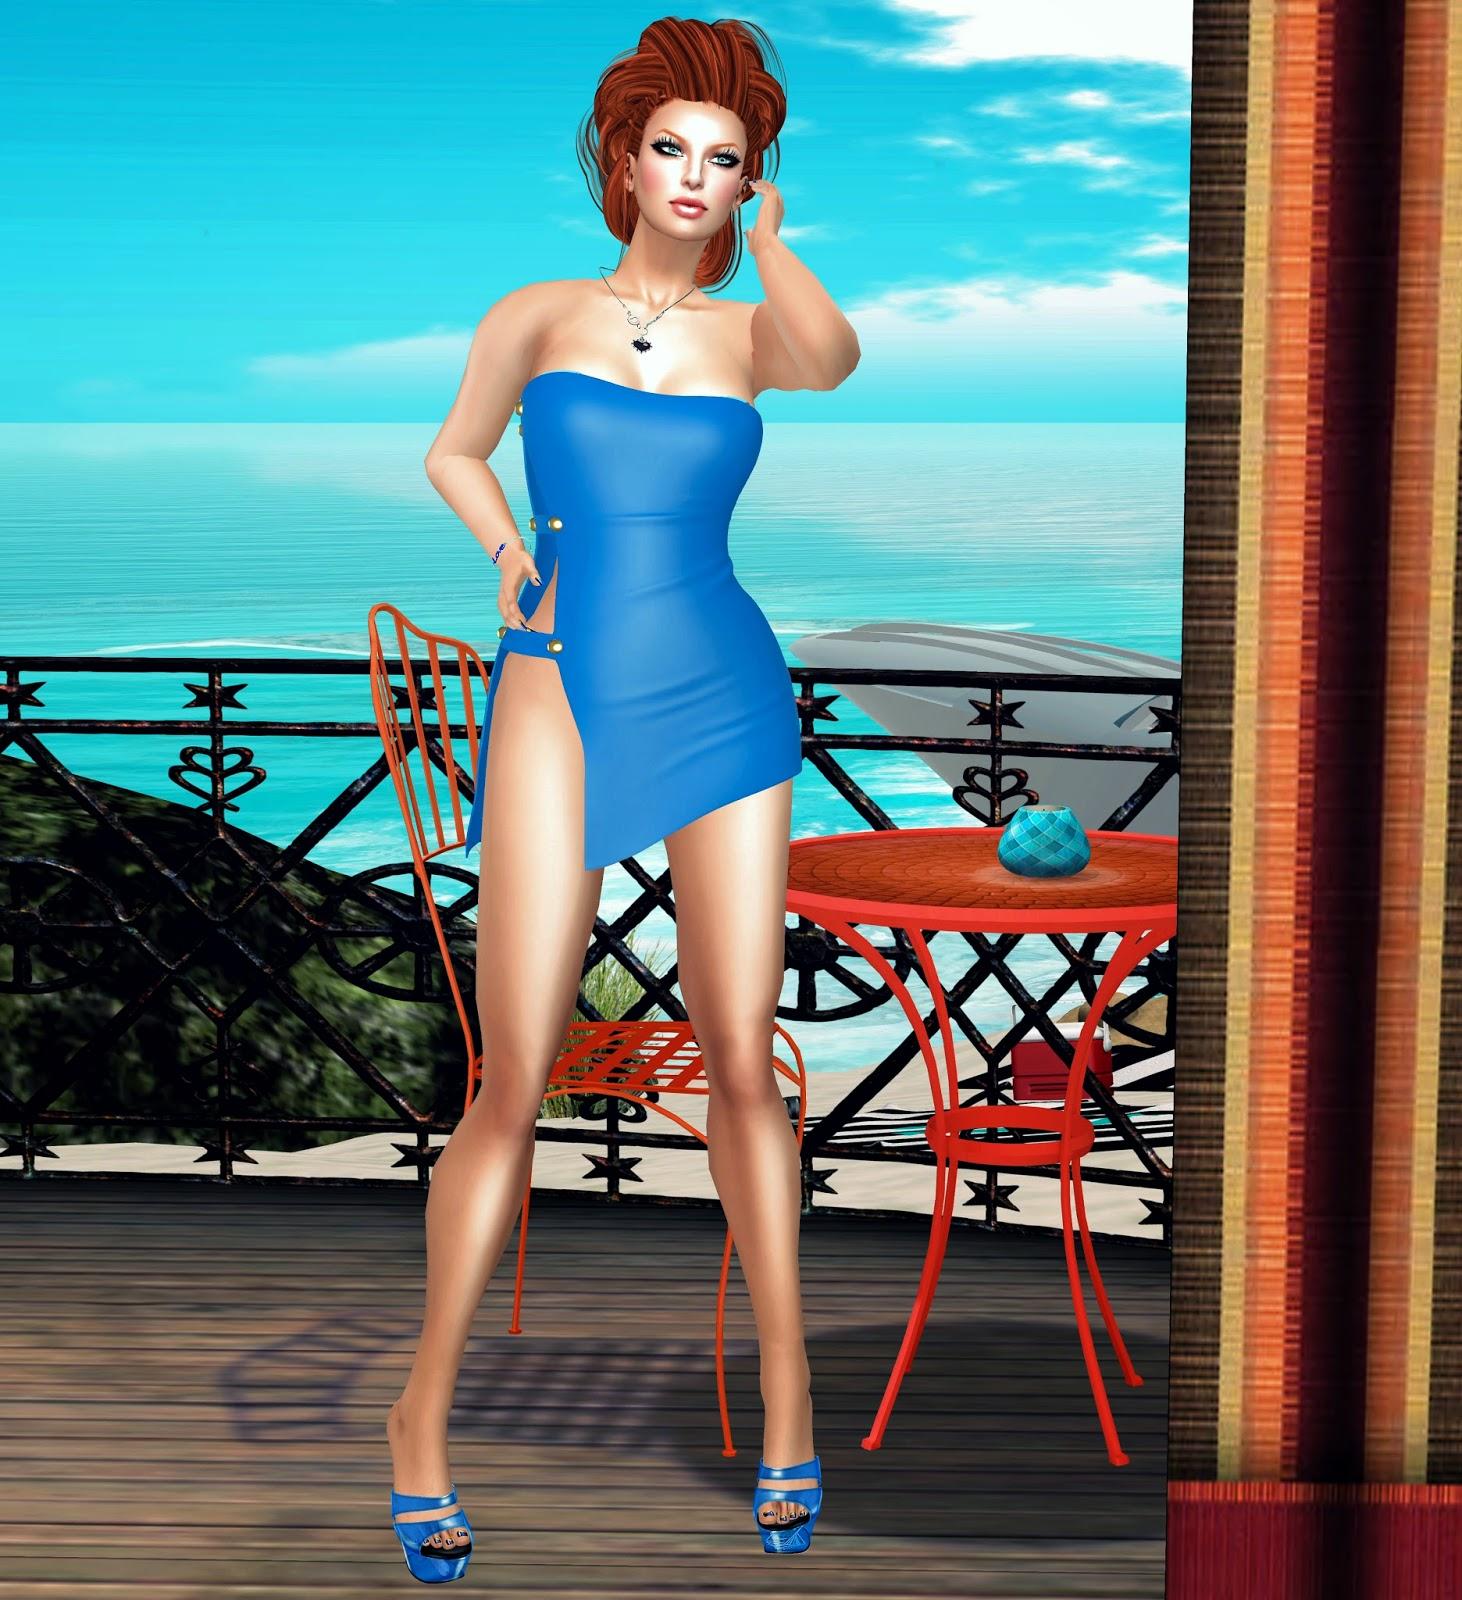 lushish catz sexy blue mini dress, vanity hair, miss canning, zoz